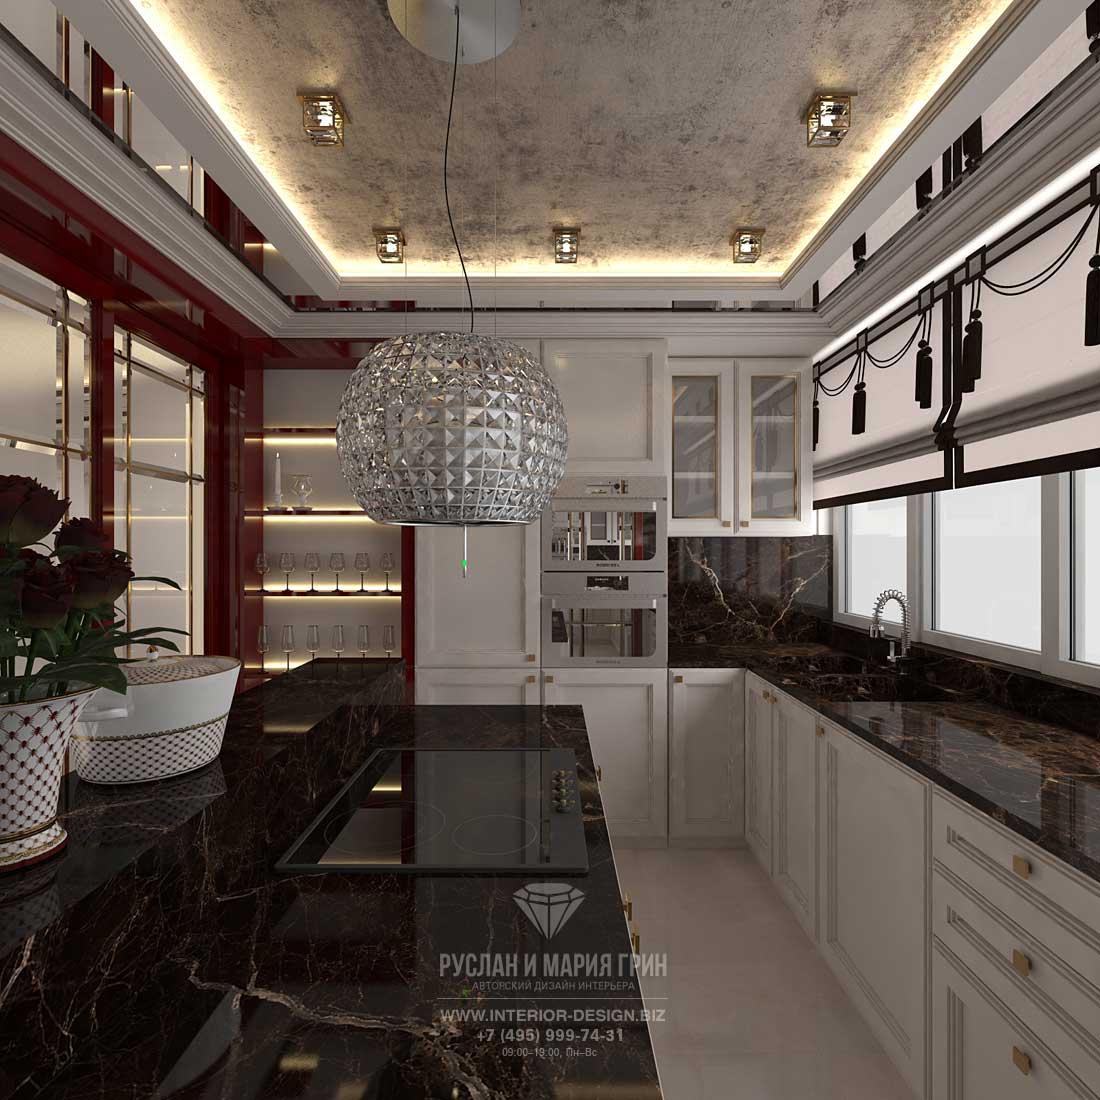 Дизайн интерьера кухни с элементами ар-деко